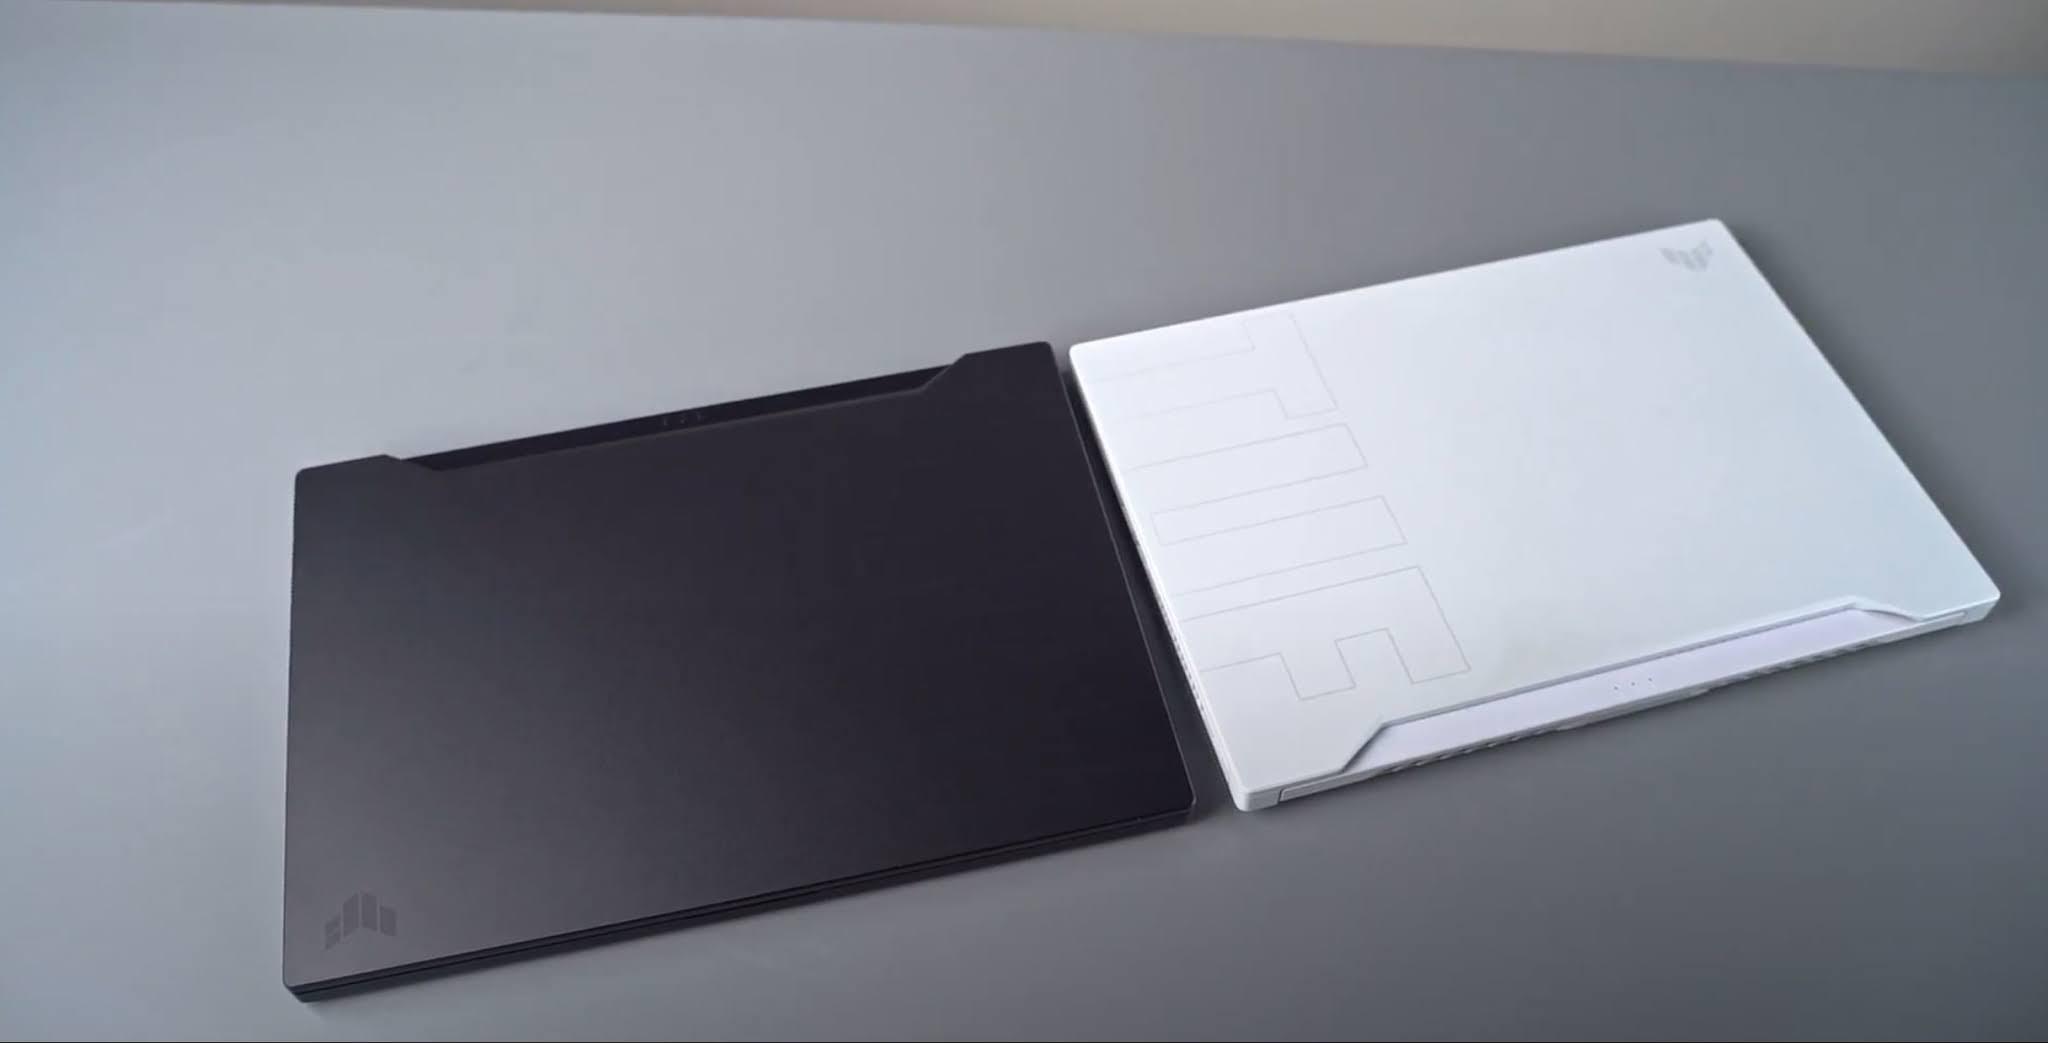 Đánh giá nhanh laptop gaming Asus TUF Dash F15